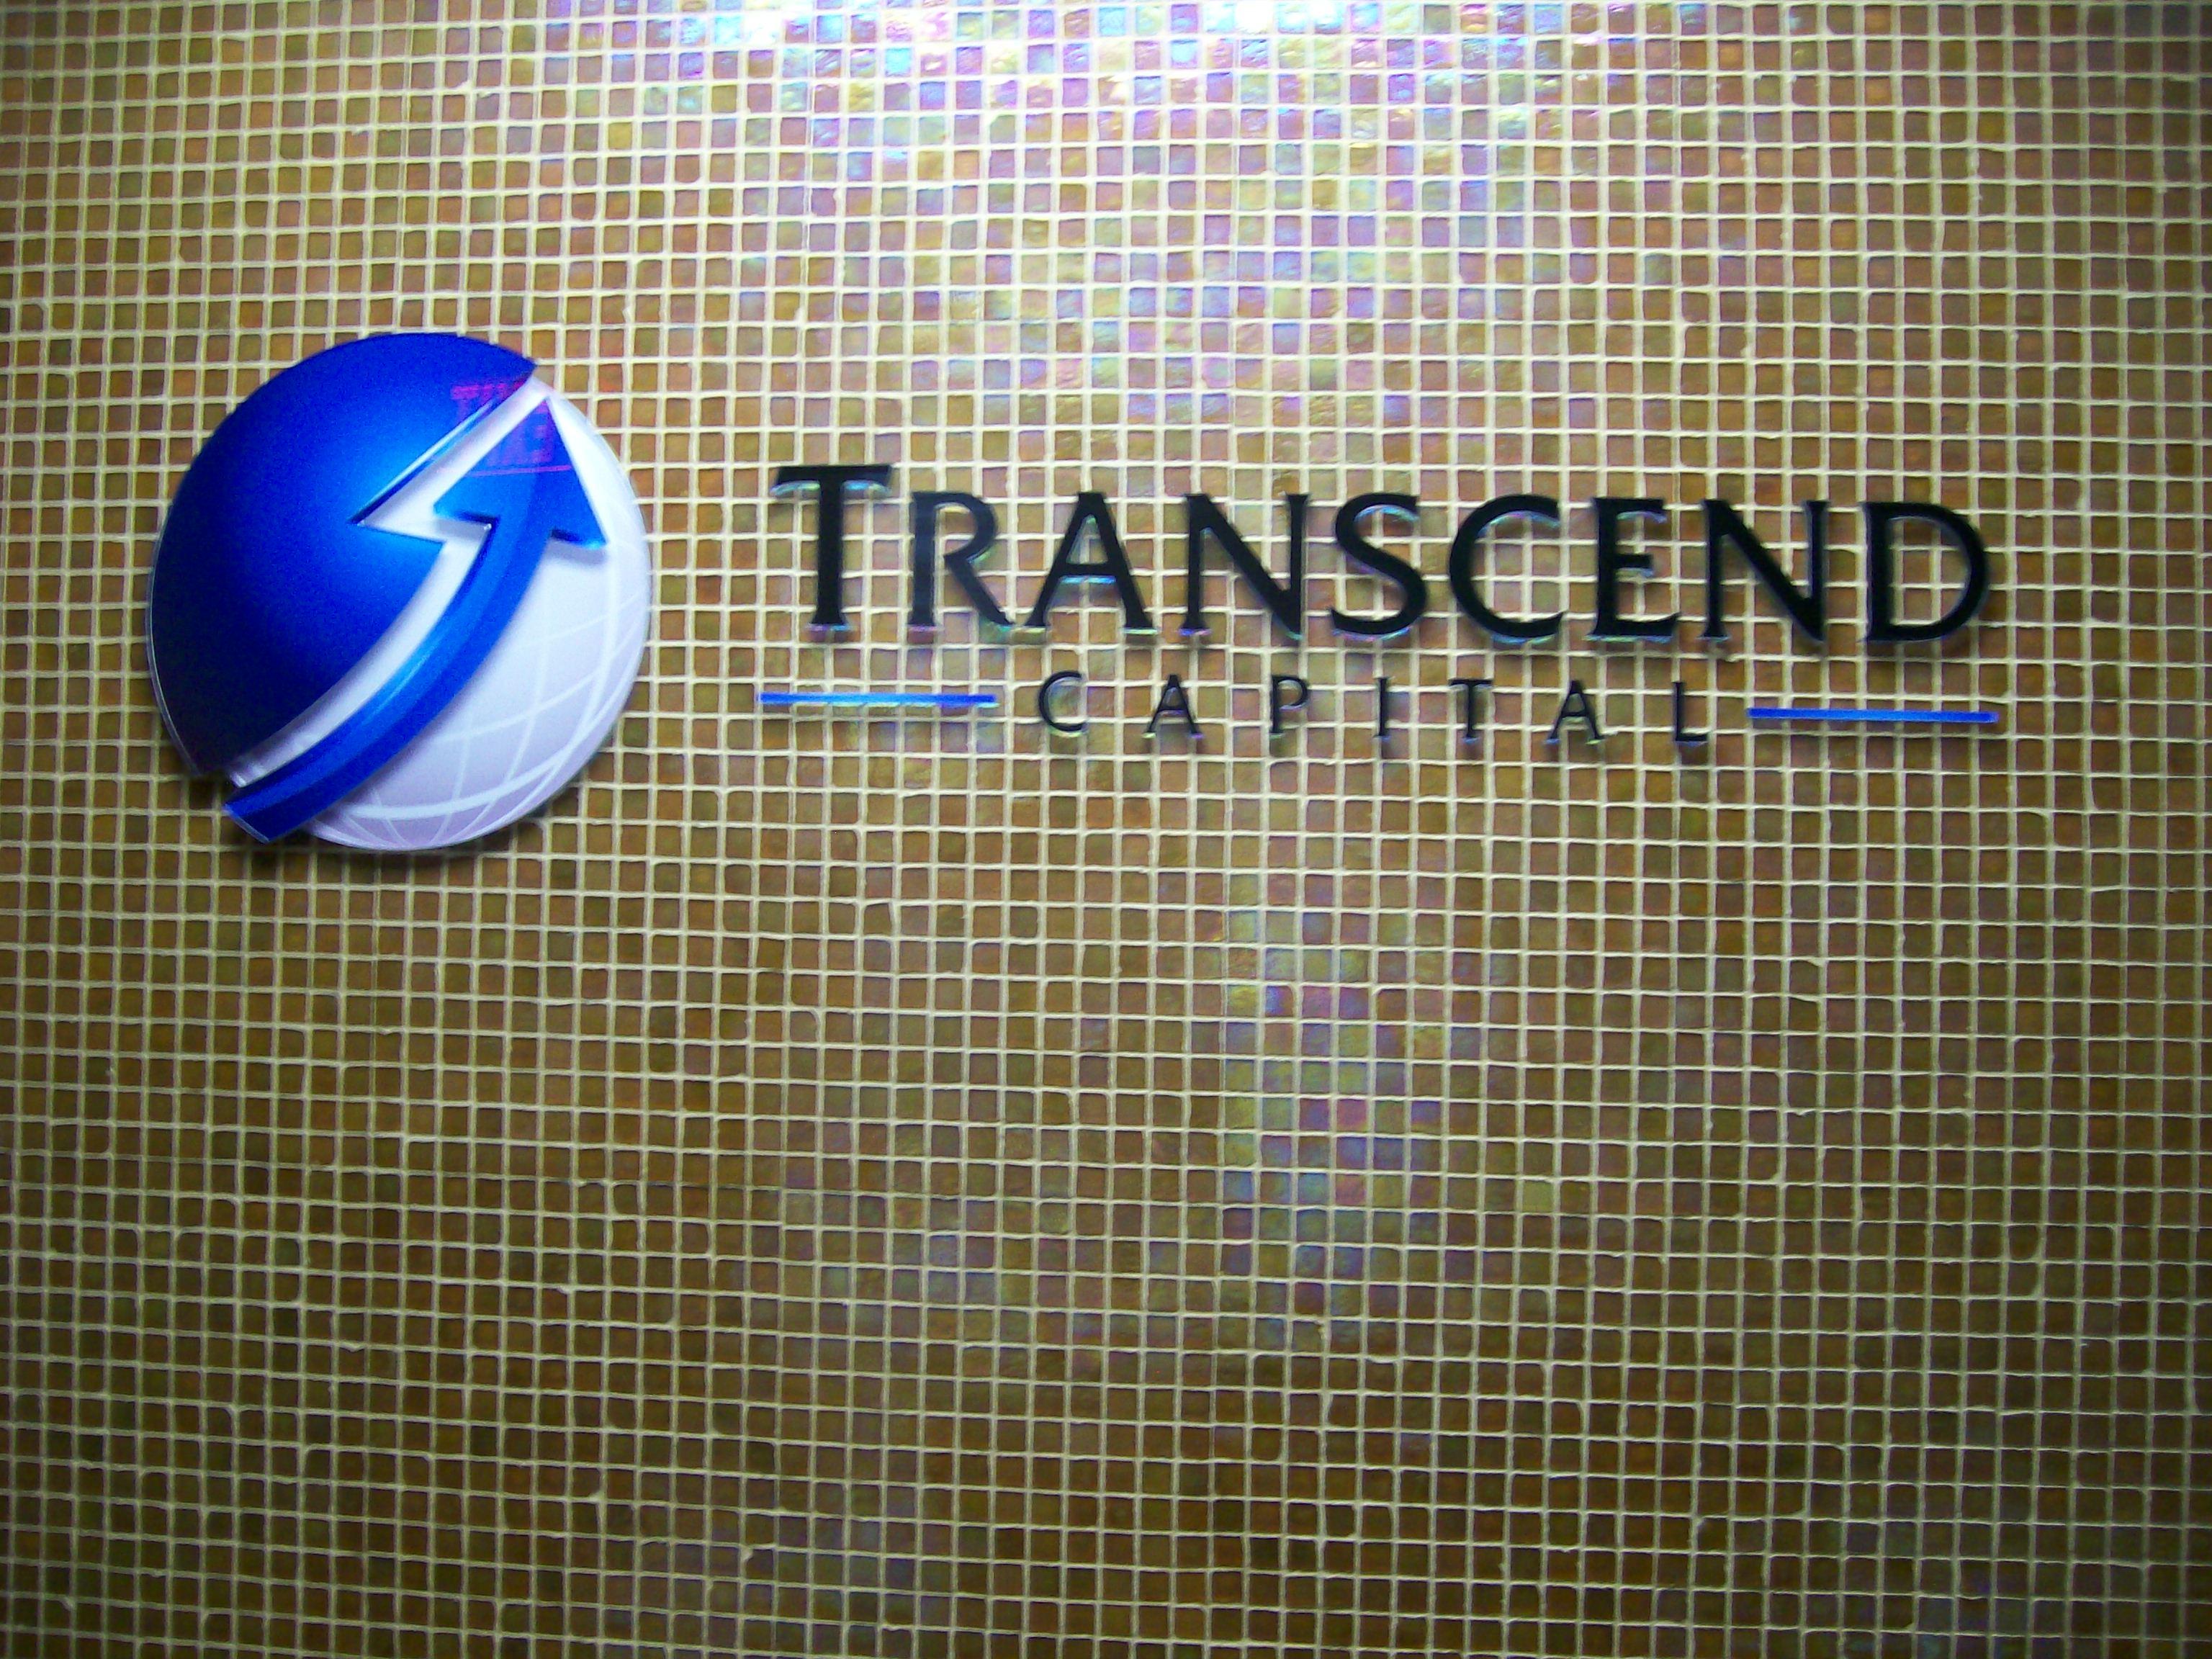 Transcend Capital - lk20796 - 3.jpg